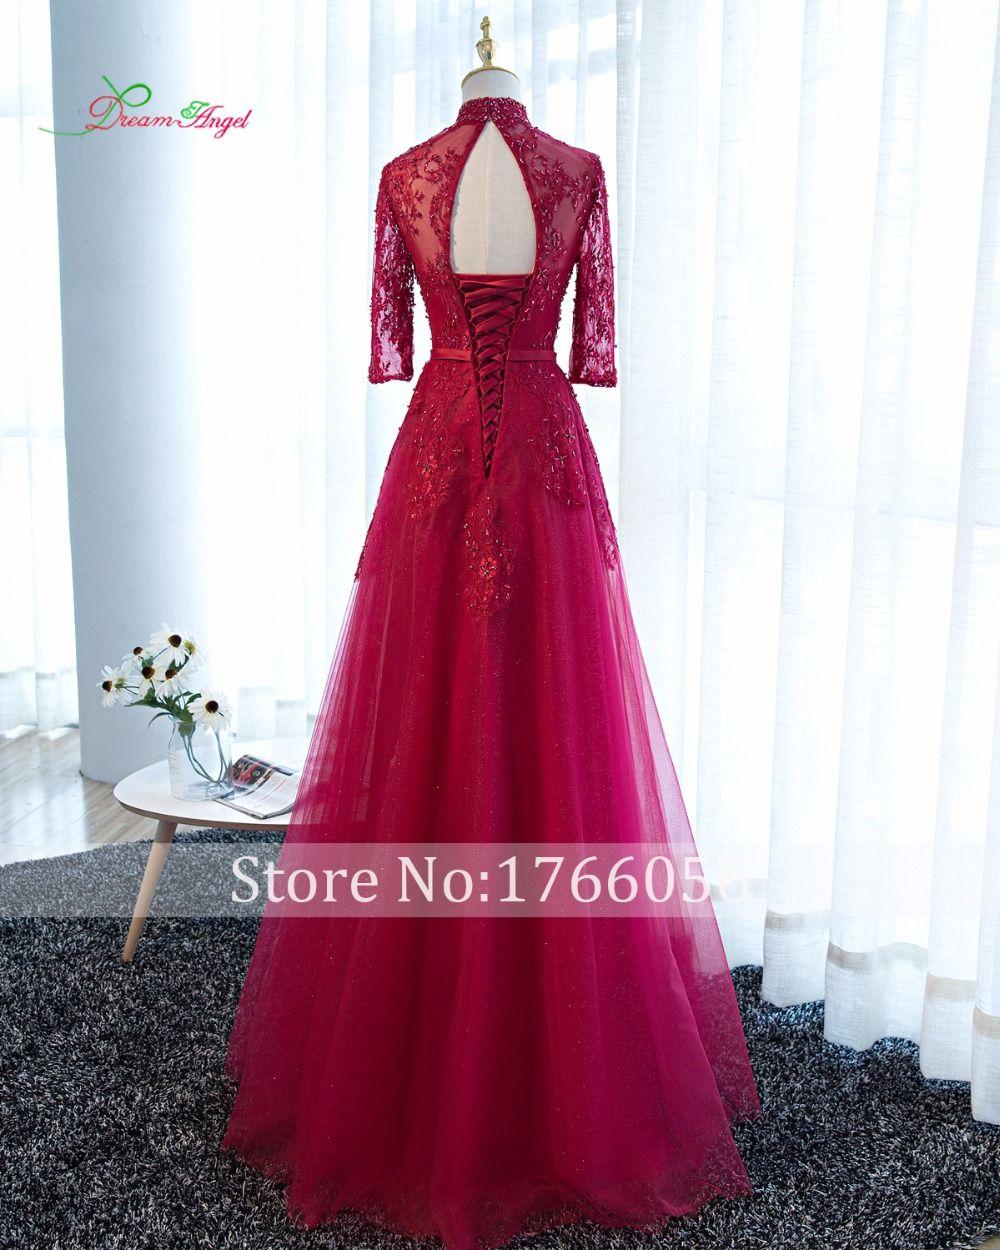 Dream angel elegant high neck a line long sleeve prom dresses